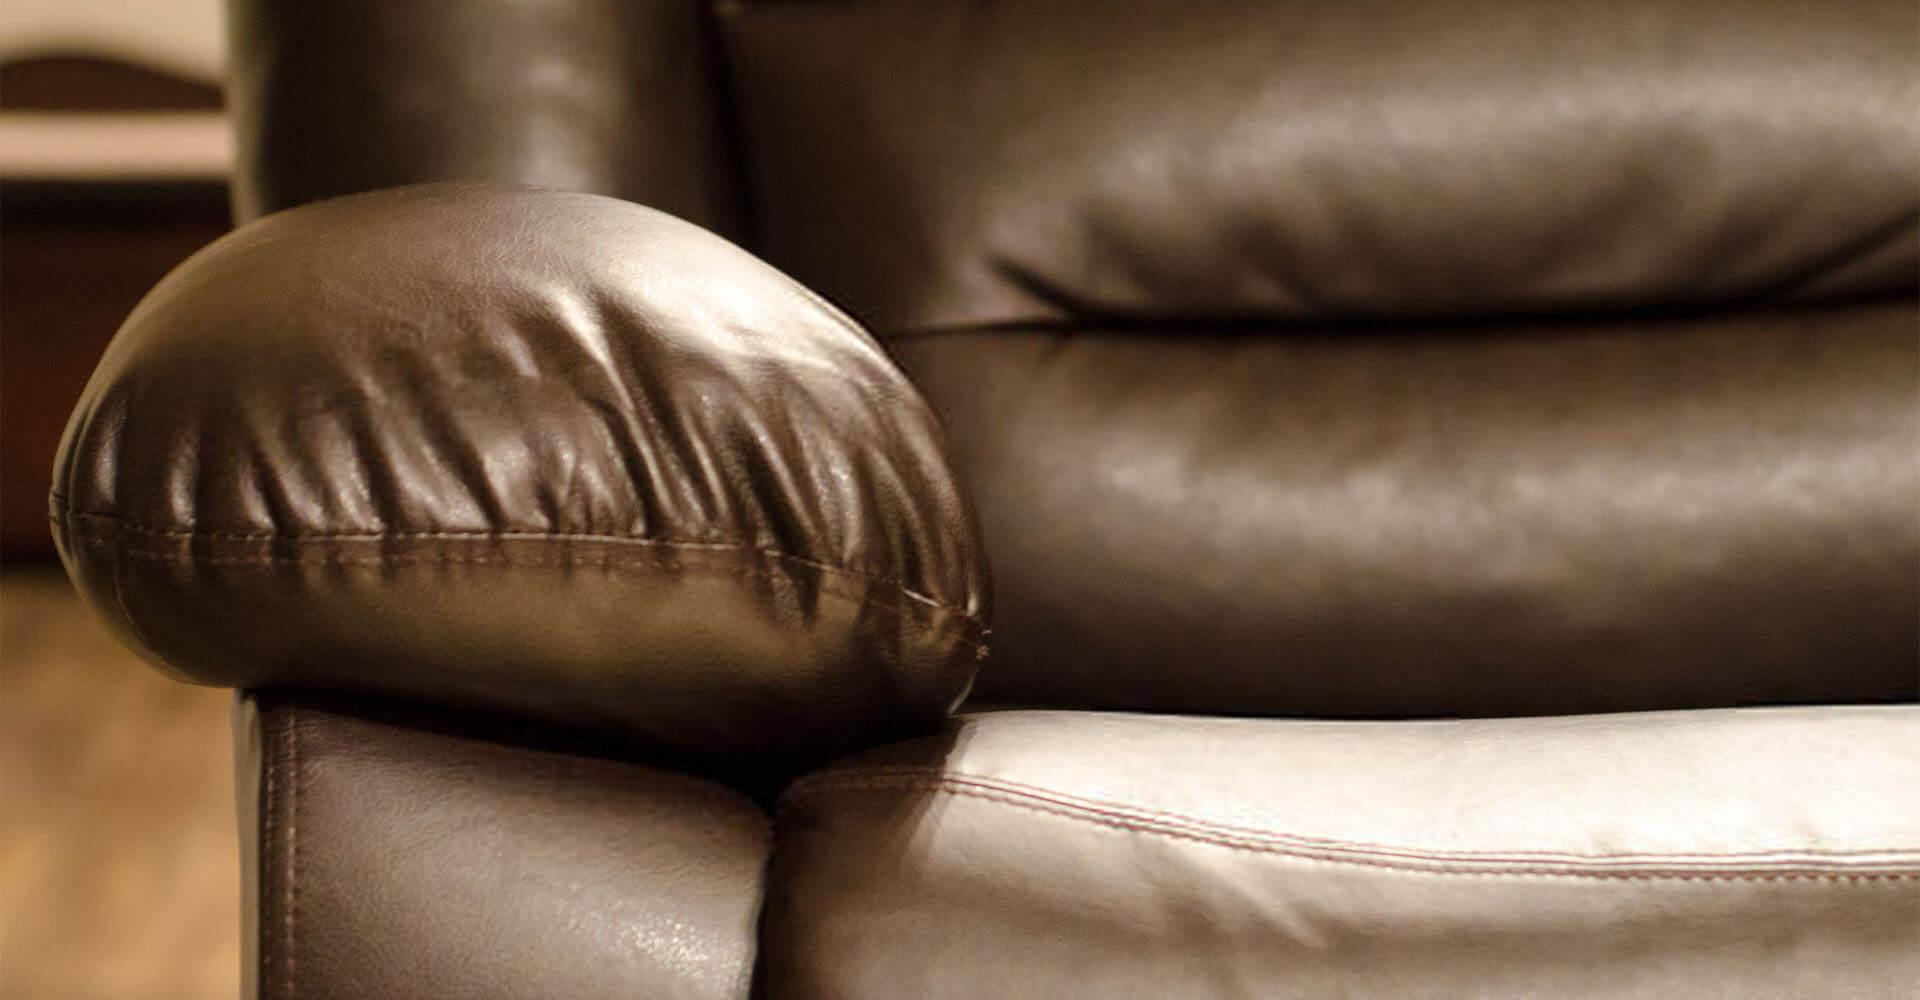 Massagesessel aus braunem Leder in Nahaufnahme